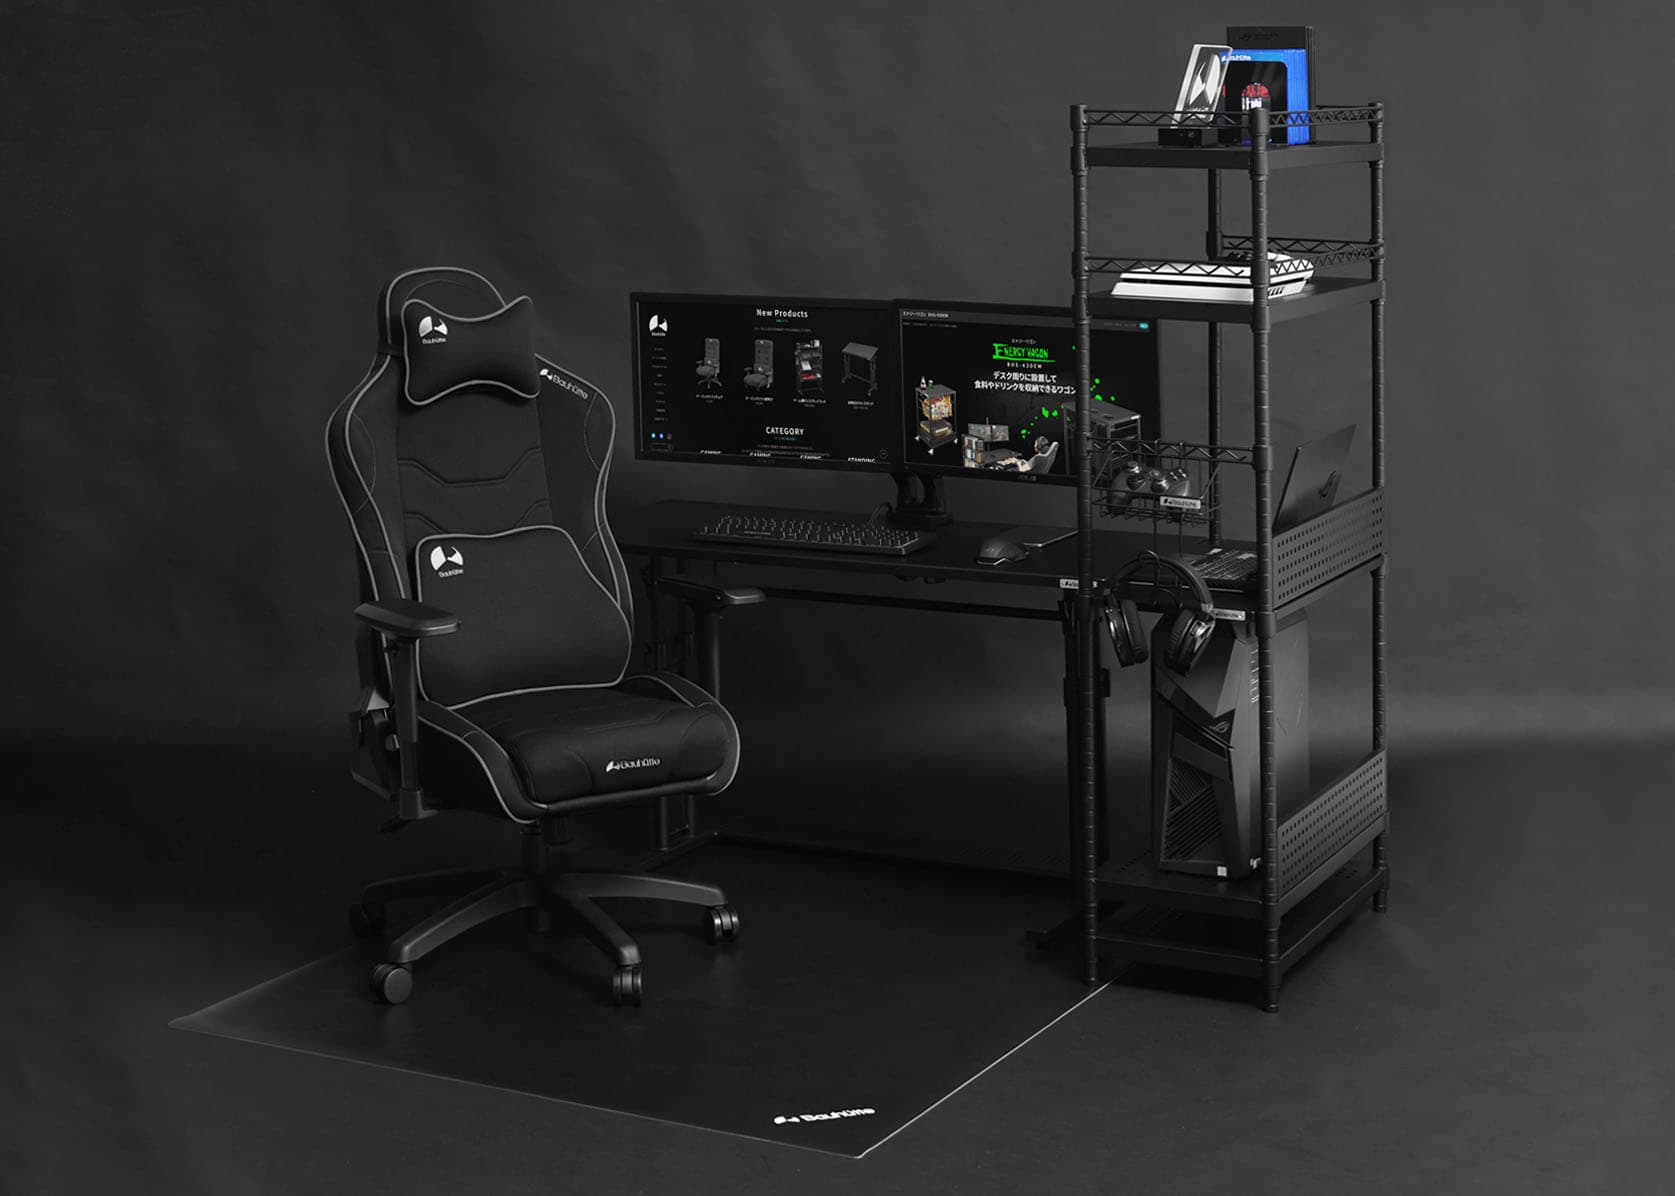 Desk Side Rack BHS-600SM / 700SM gallery